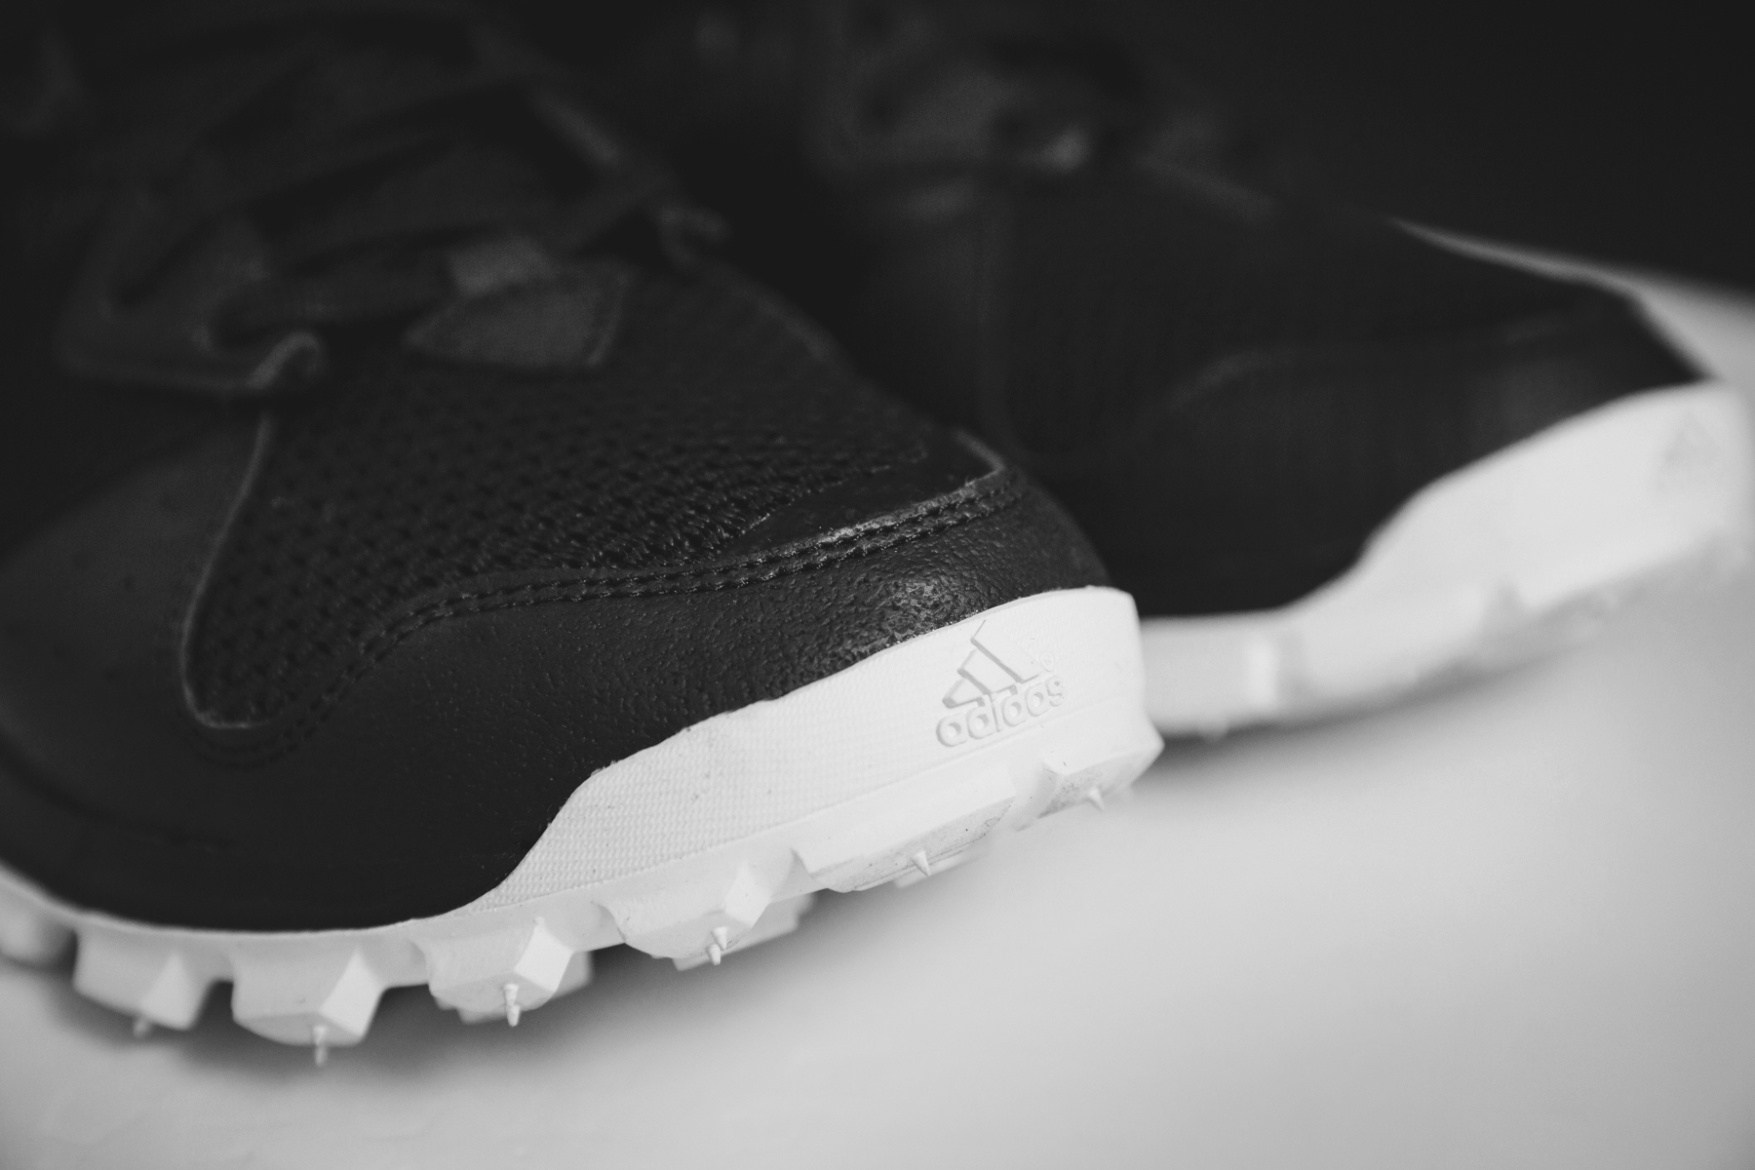 adidasresponseboost_pause4